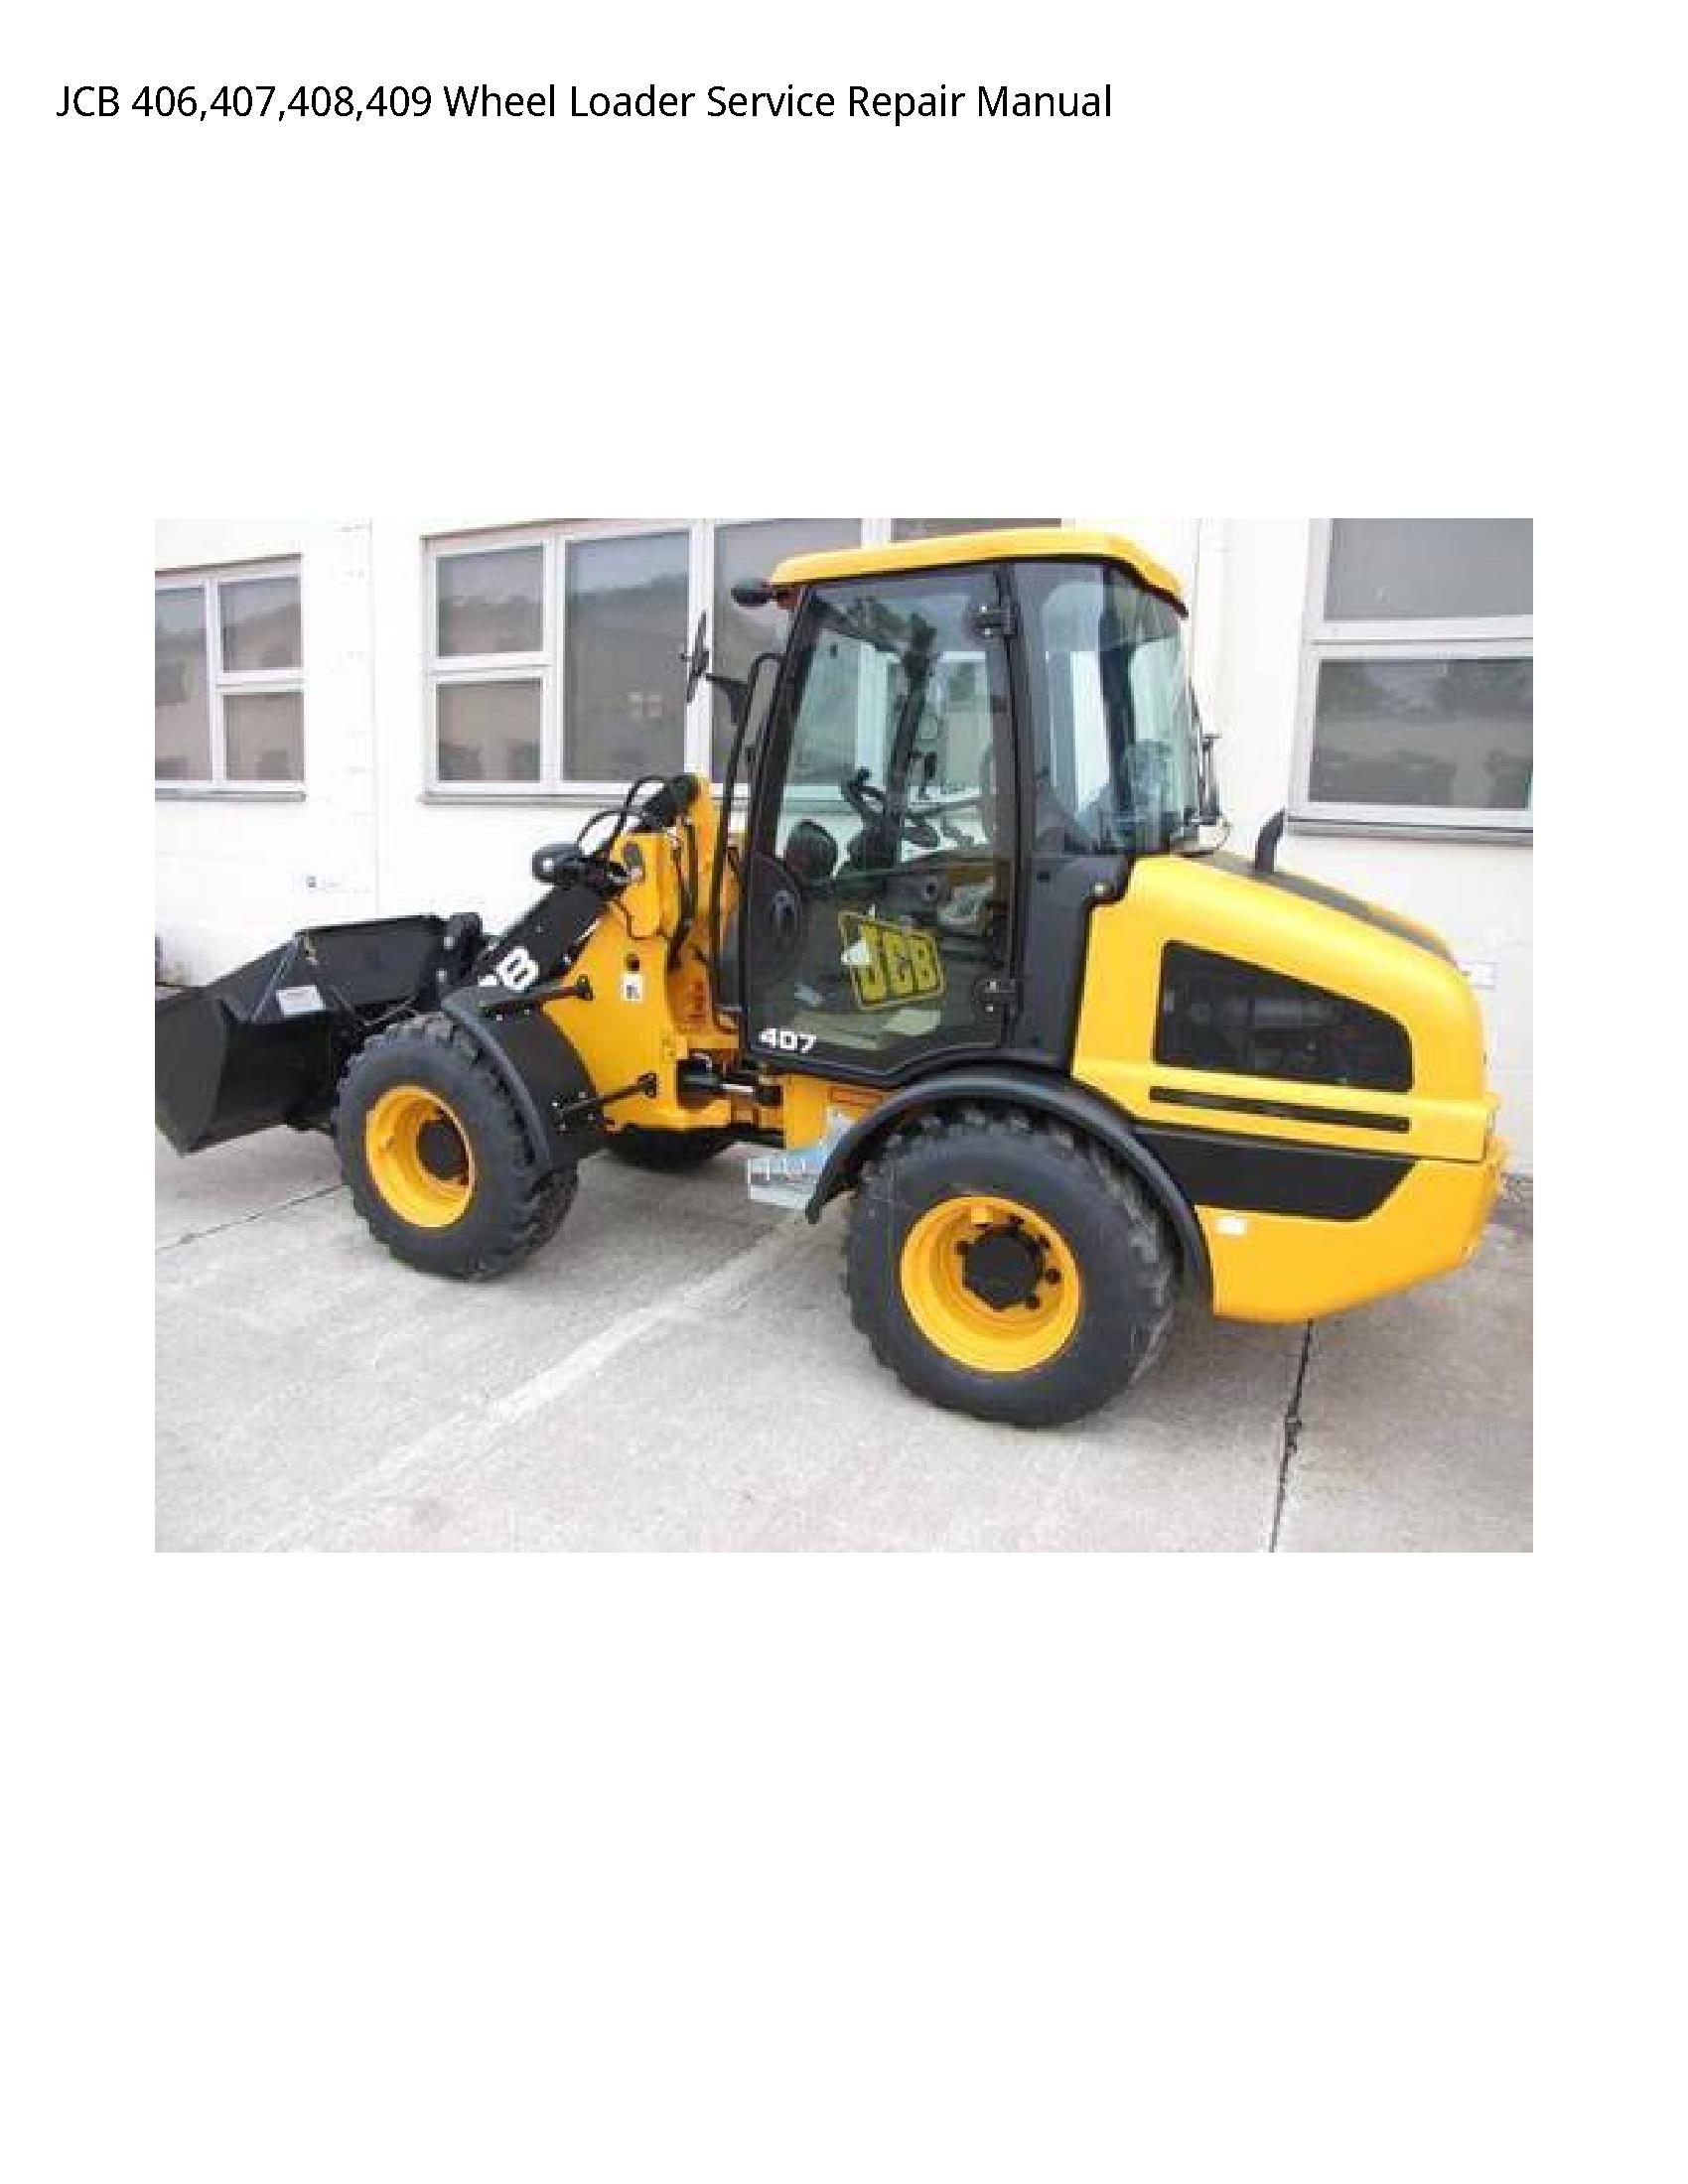 ENGINE Workshop Repair Manual JCB Wheel Loading Shovel 406 407 408 409